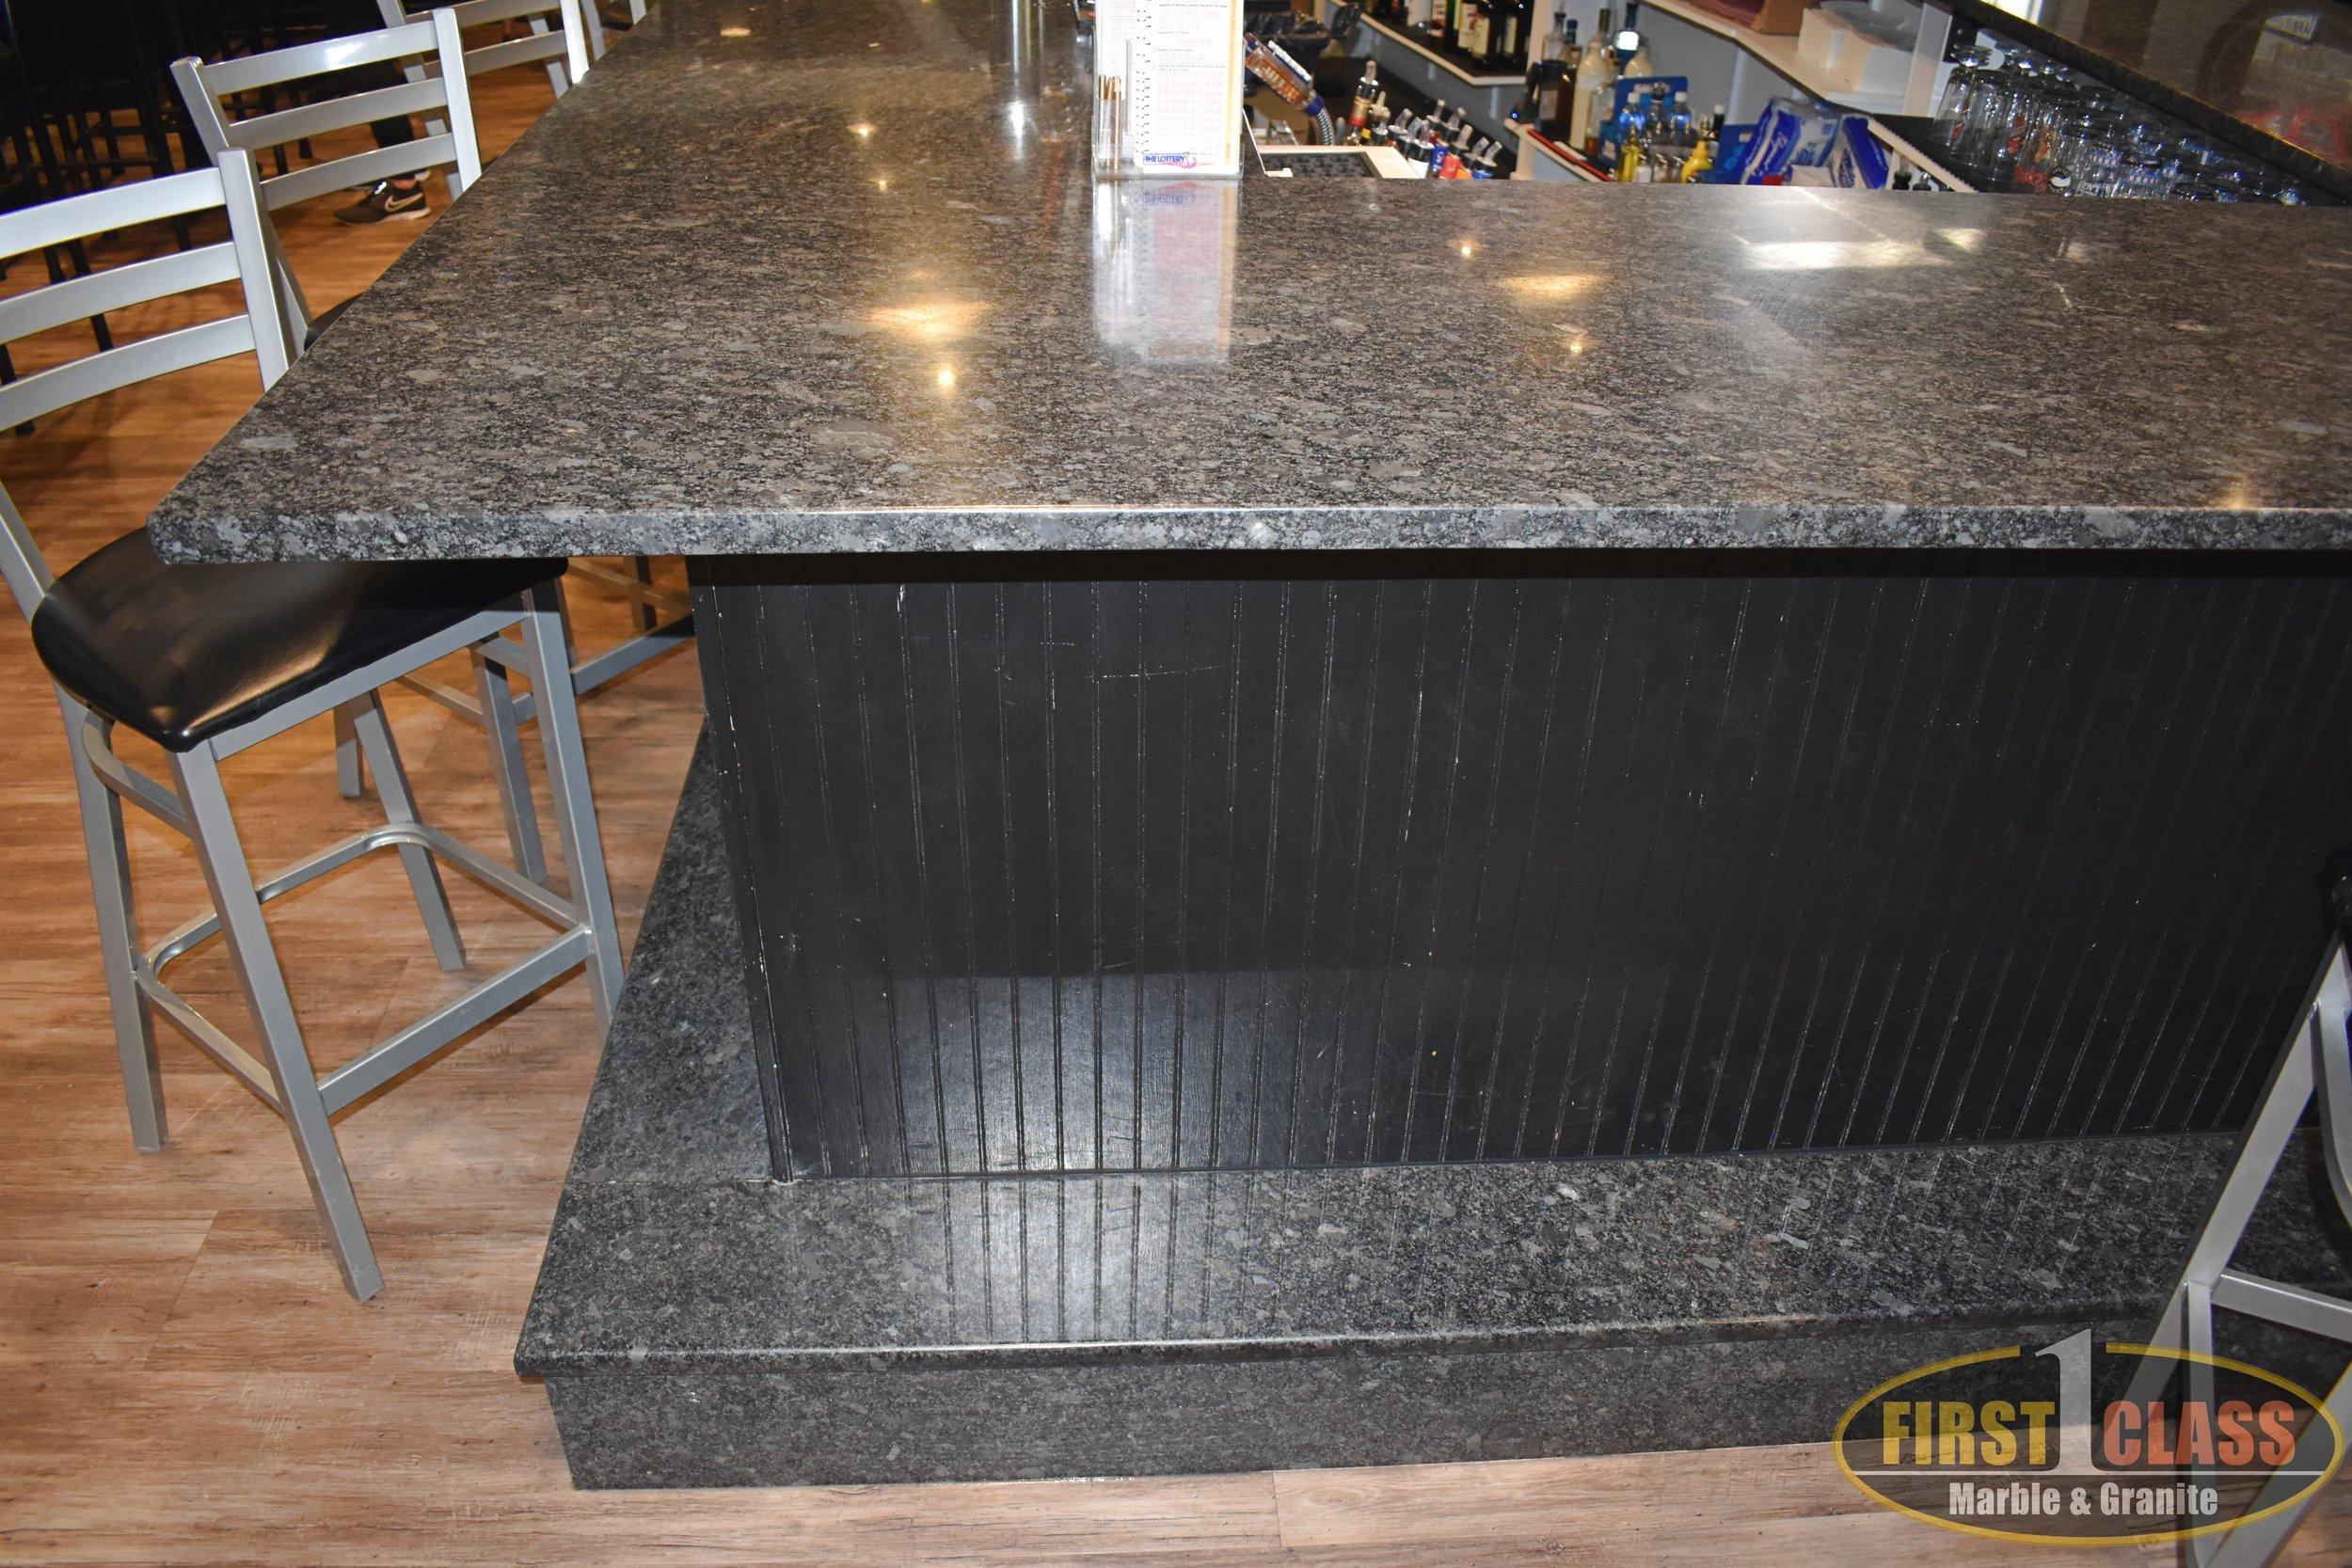 "Material: Steel Grey  Thickness, Finish & Stone Type: 3CM Polished Granite  Edge:  Eased 3/8"" Radius - Foot Ledge"